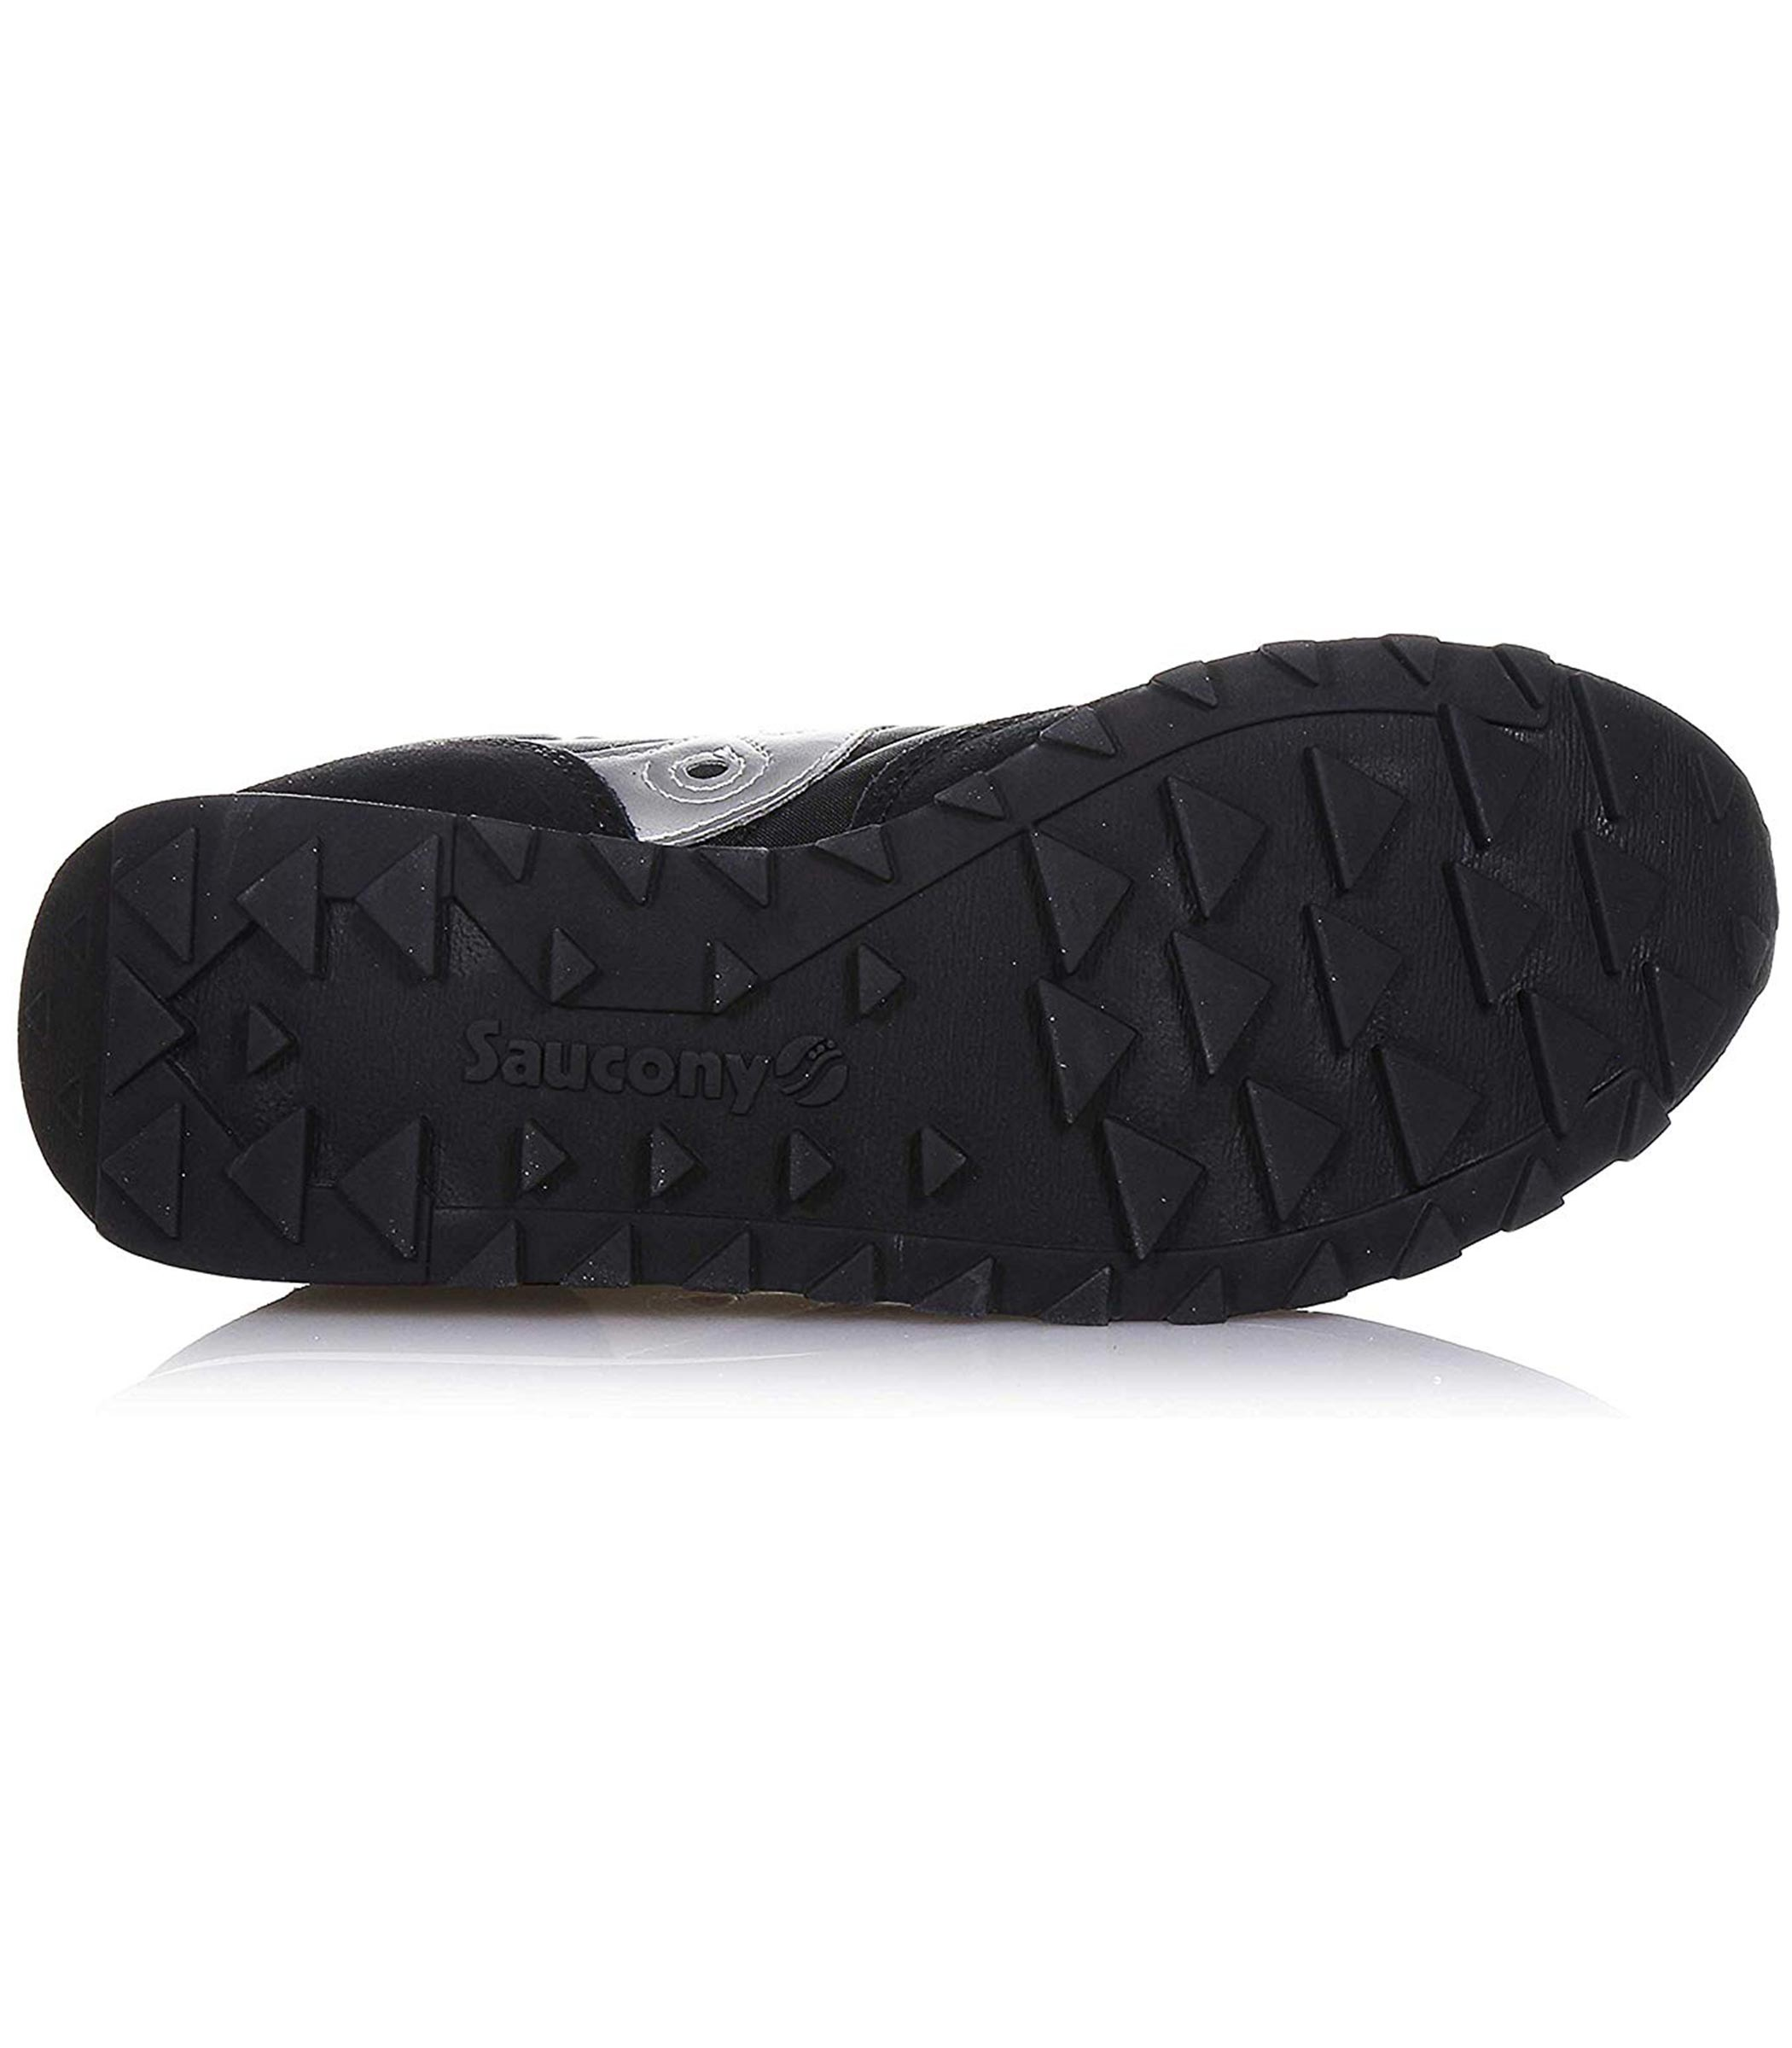 online store 7fa0a 96d1b scarpe-saucony-sy-jazz-o-vintage-black-ragazzo-unisex-rif-sy59169.jpg